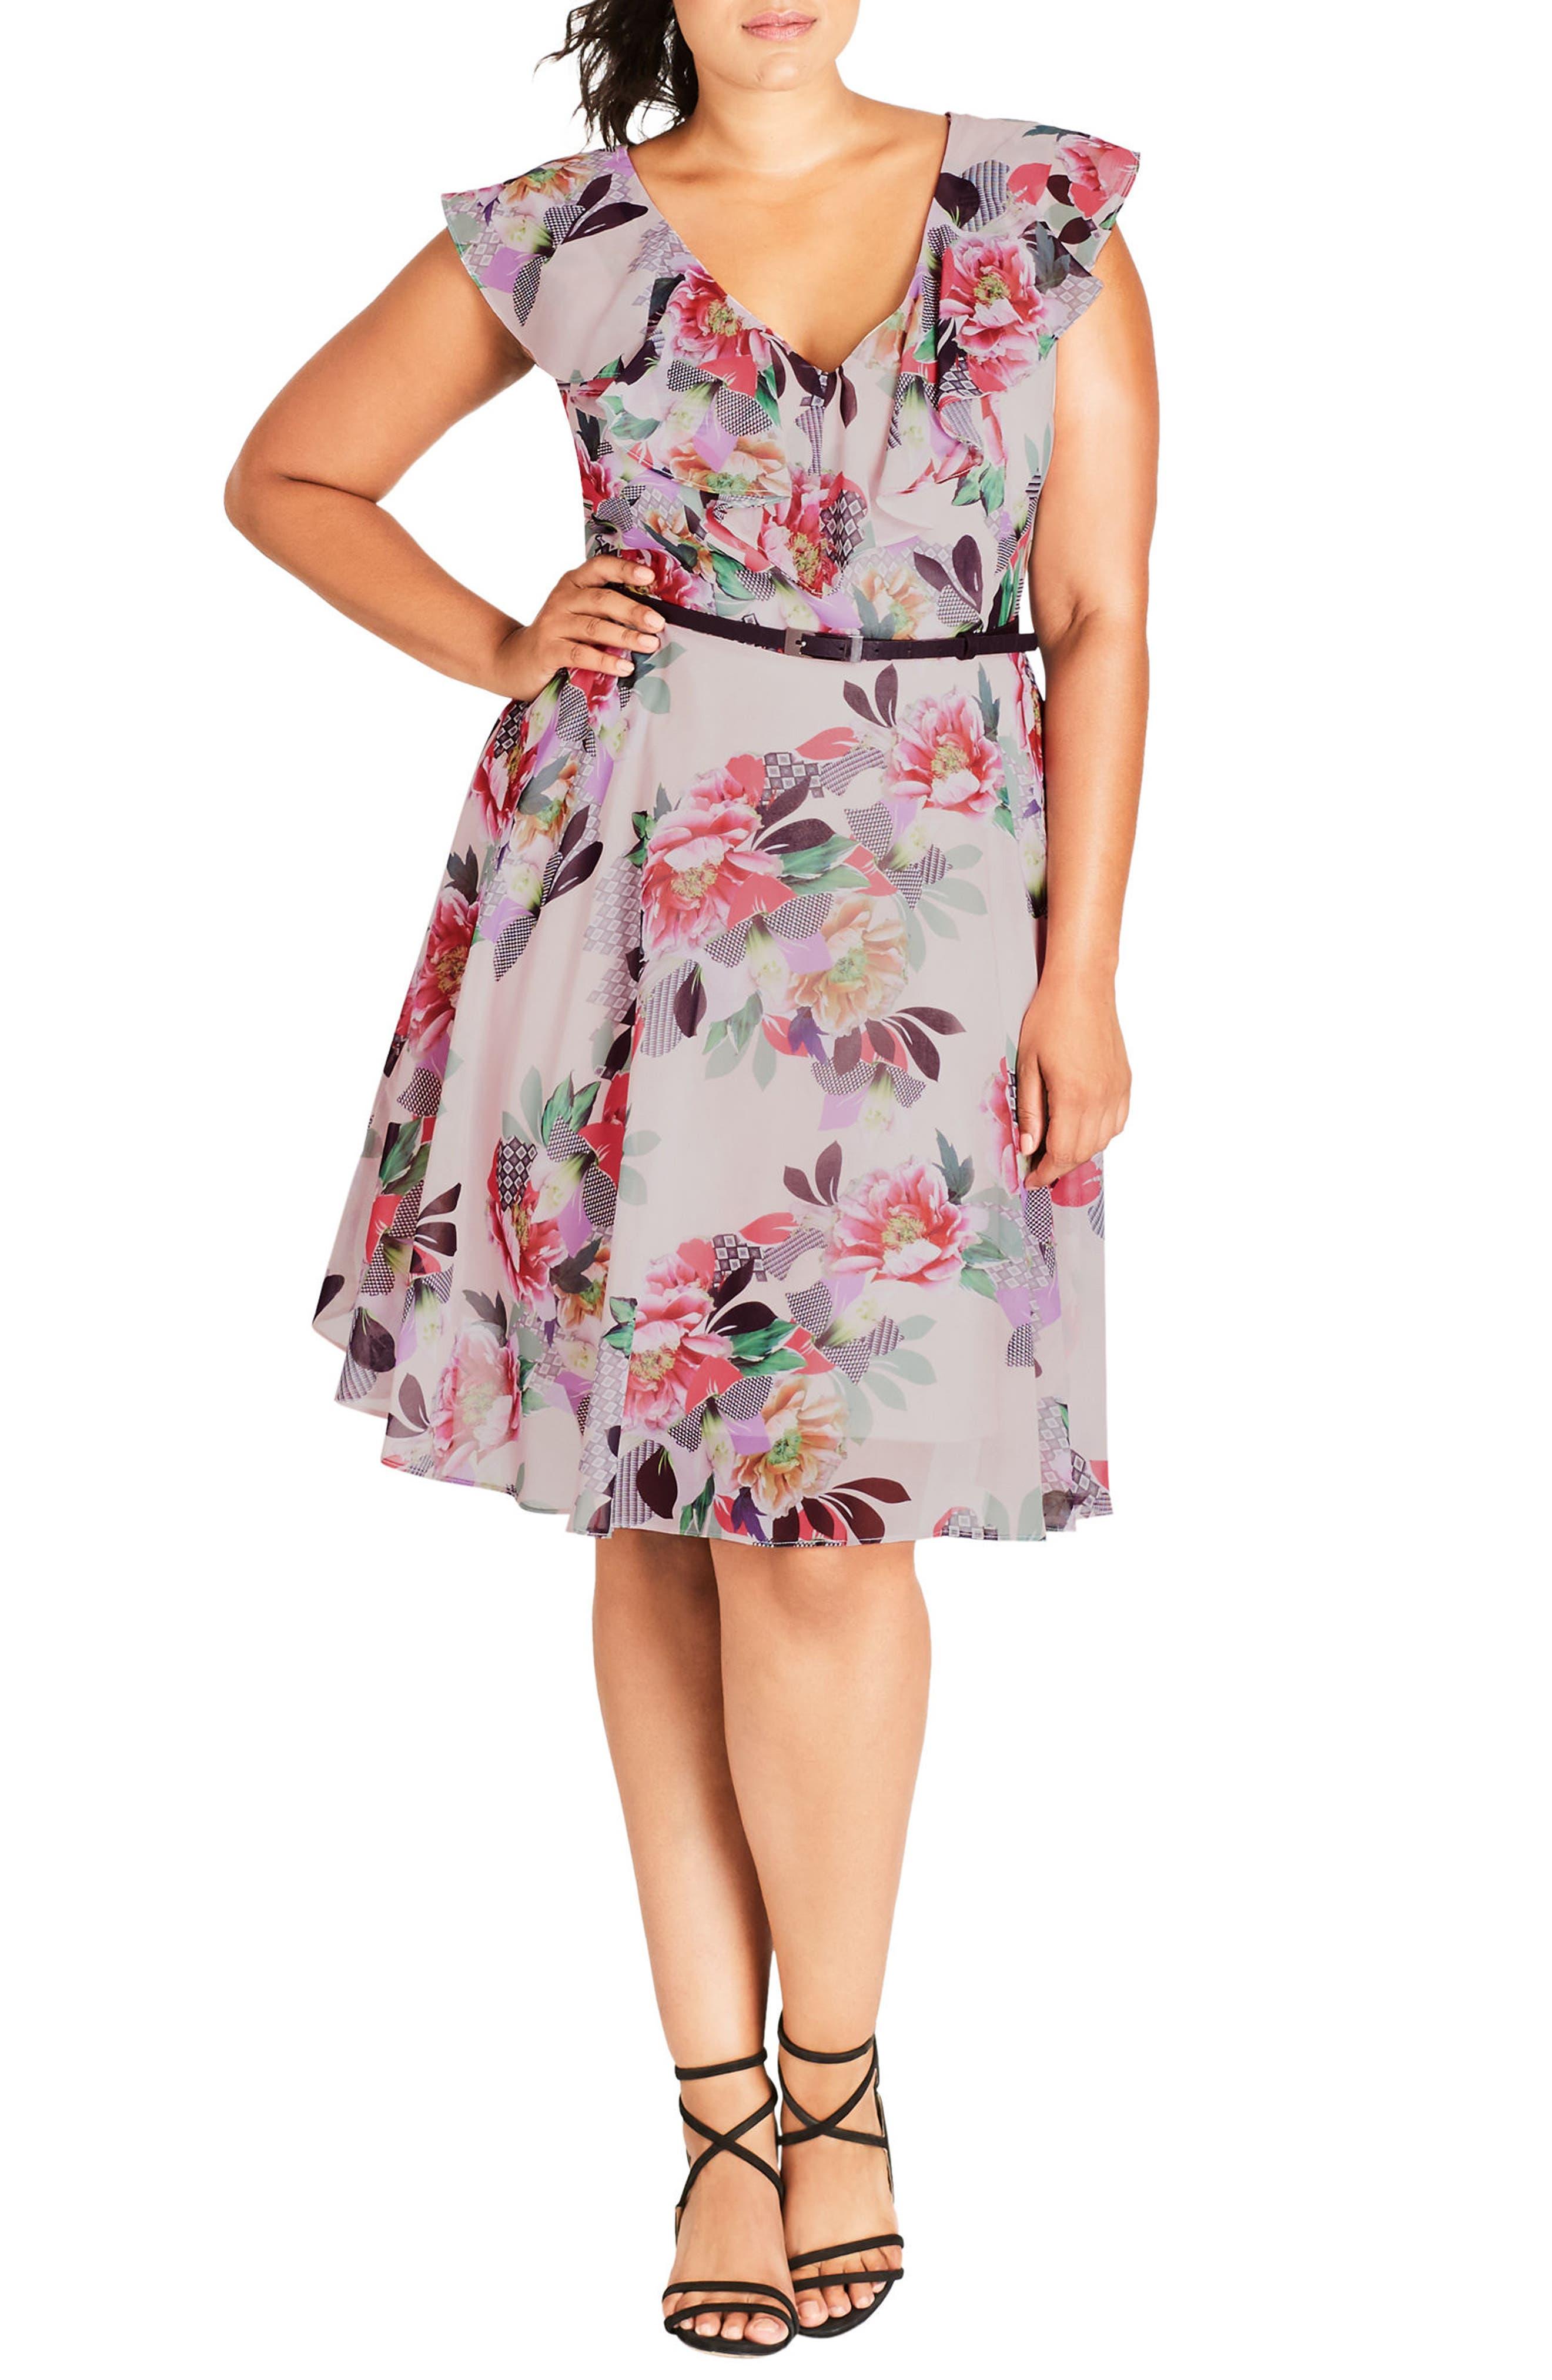 Romance Ruffle Floral Fit & Flare Dress,                             Main thumbnail 1, color,                             650